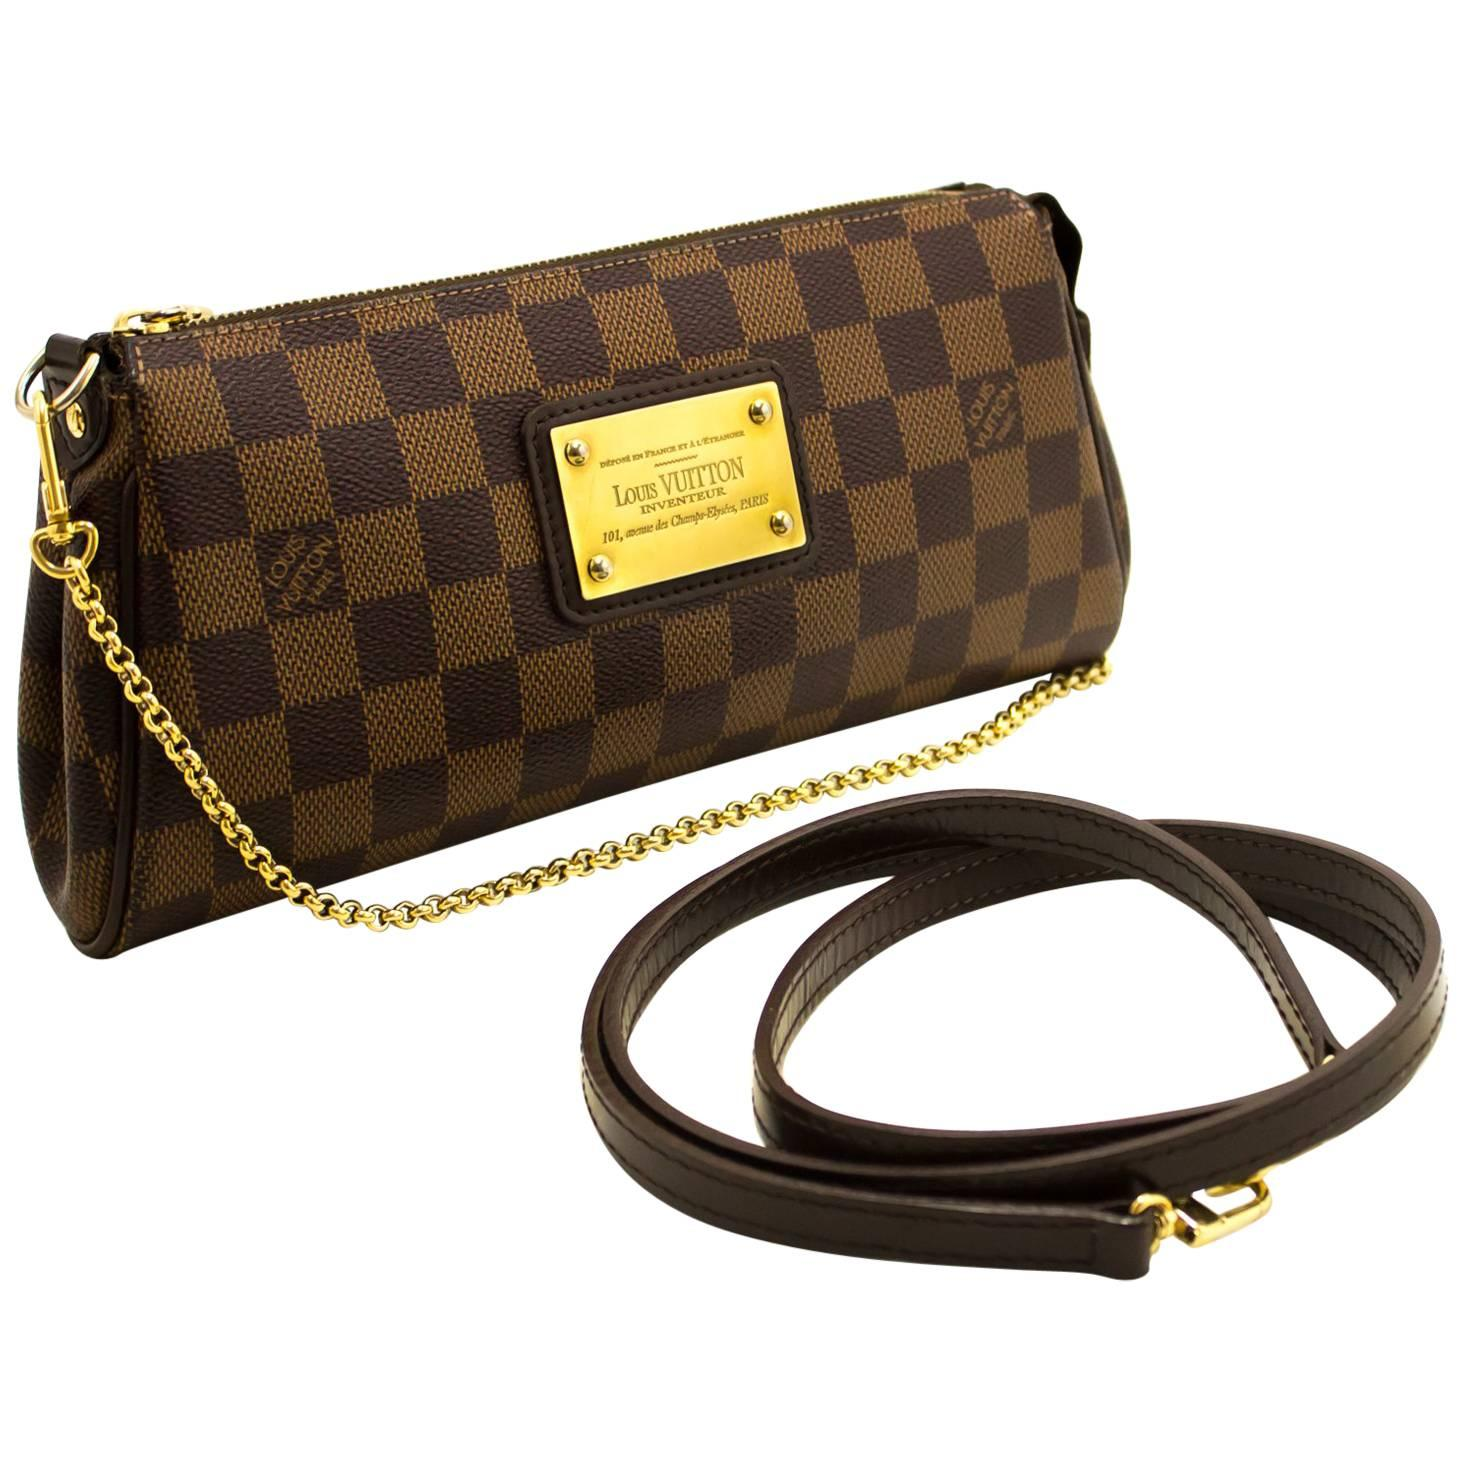 1stdibs Louis Vuitton Eva Ebene Damier Canvas Shoulder Bag Handbag Gold AUplRzQ